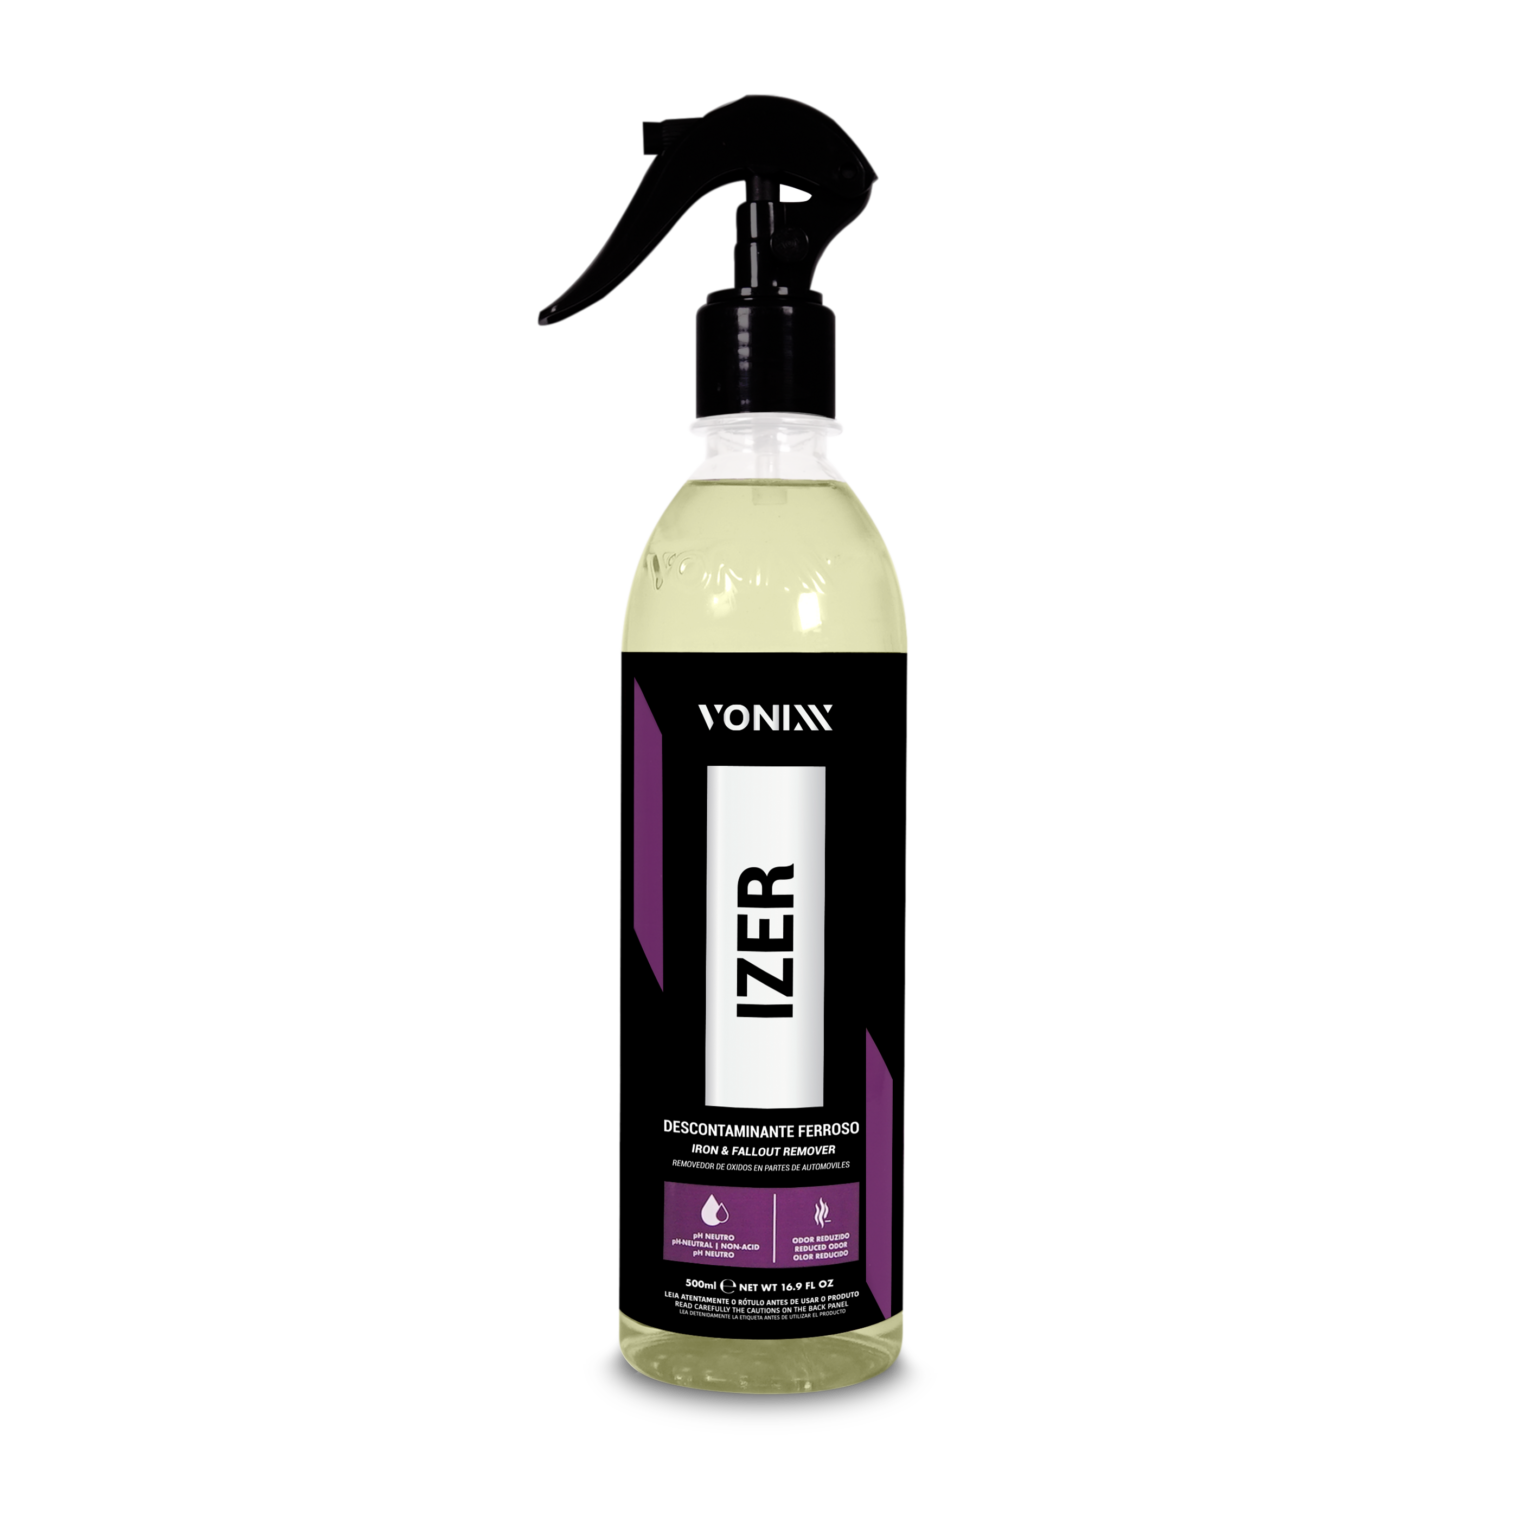 Izer – Descontaminante Ferroso - 500ml - Vonixx - REFIL